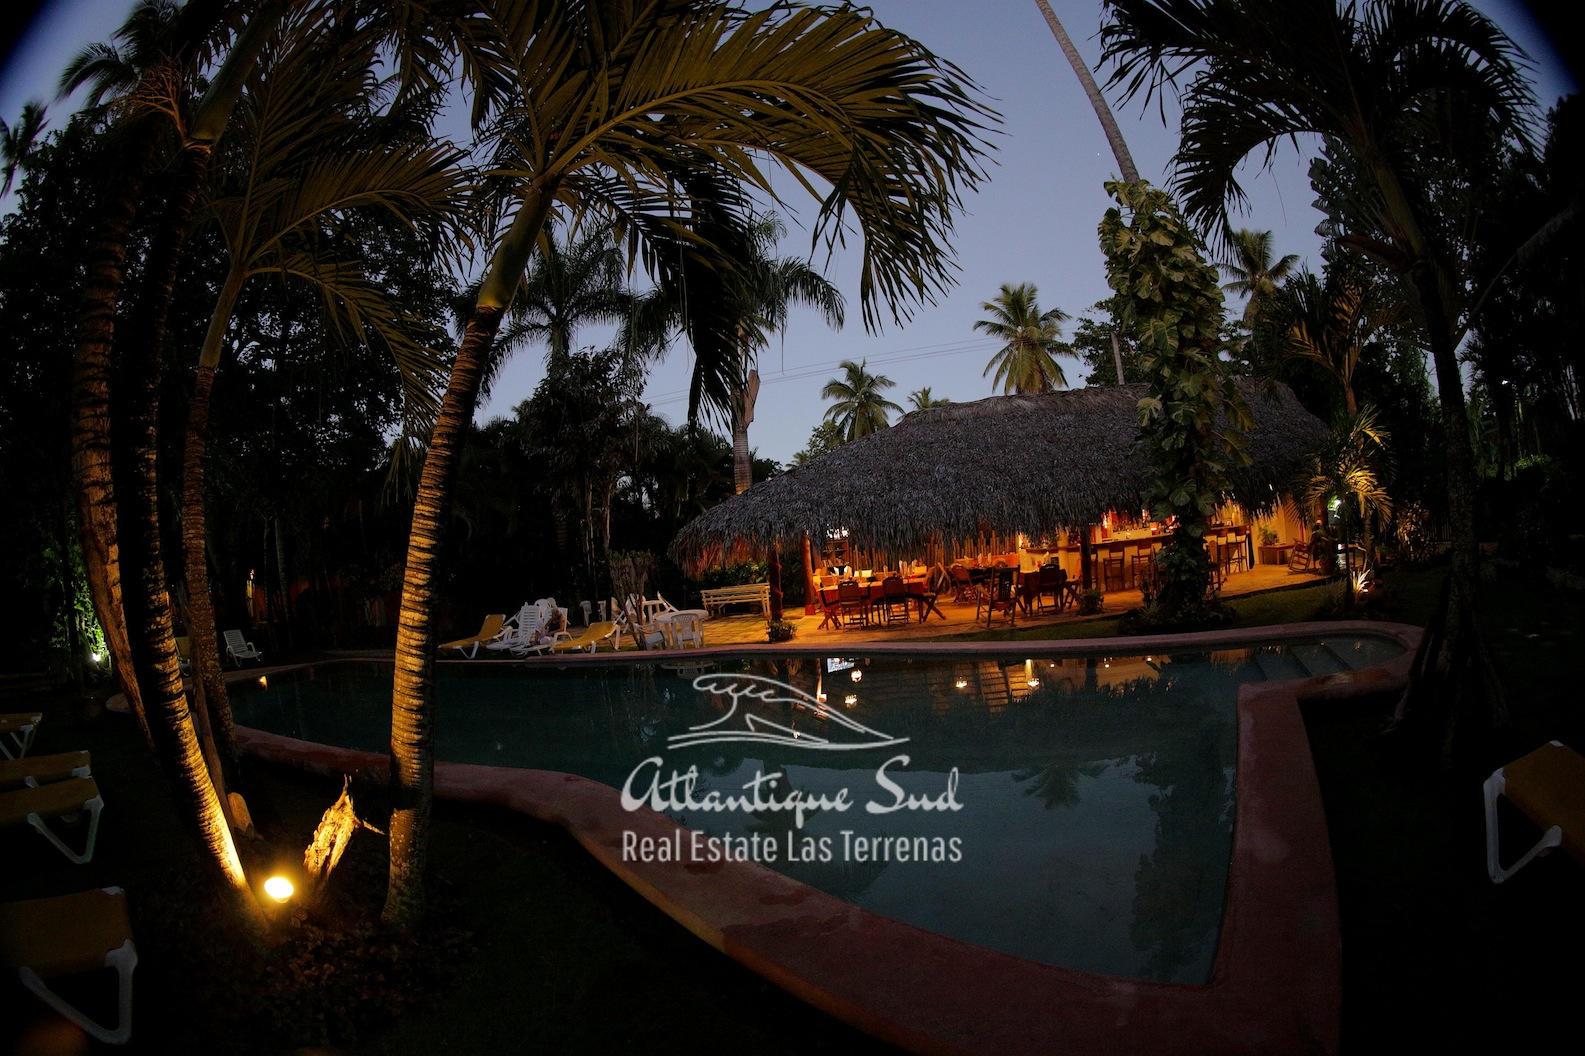 Colourful caribbean hotel in touristic heart Real Estate Las Terrenas Dominican Republic20.jpg